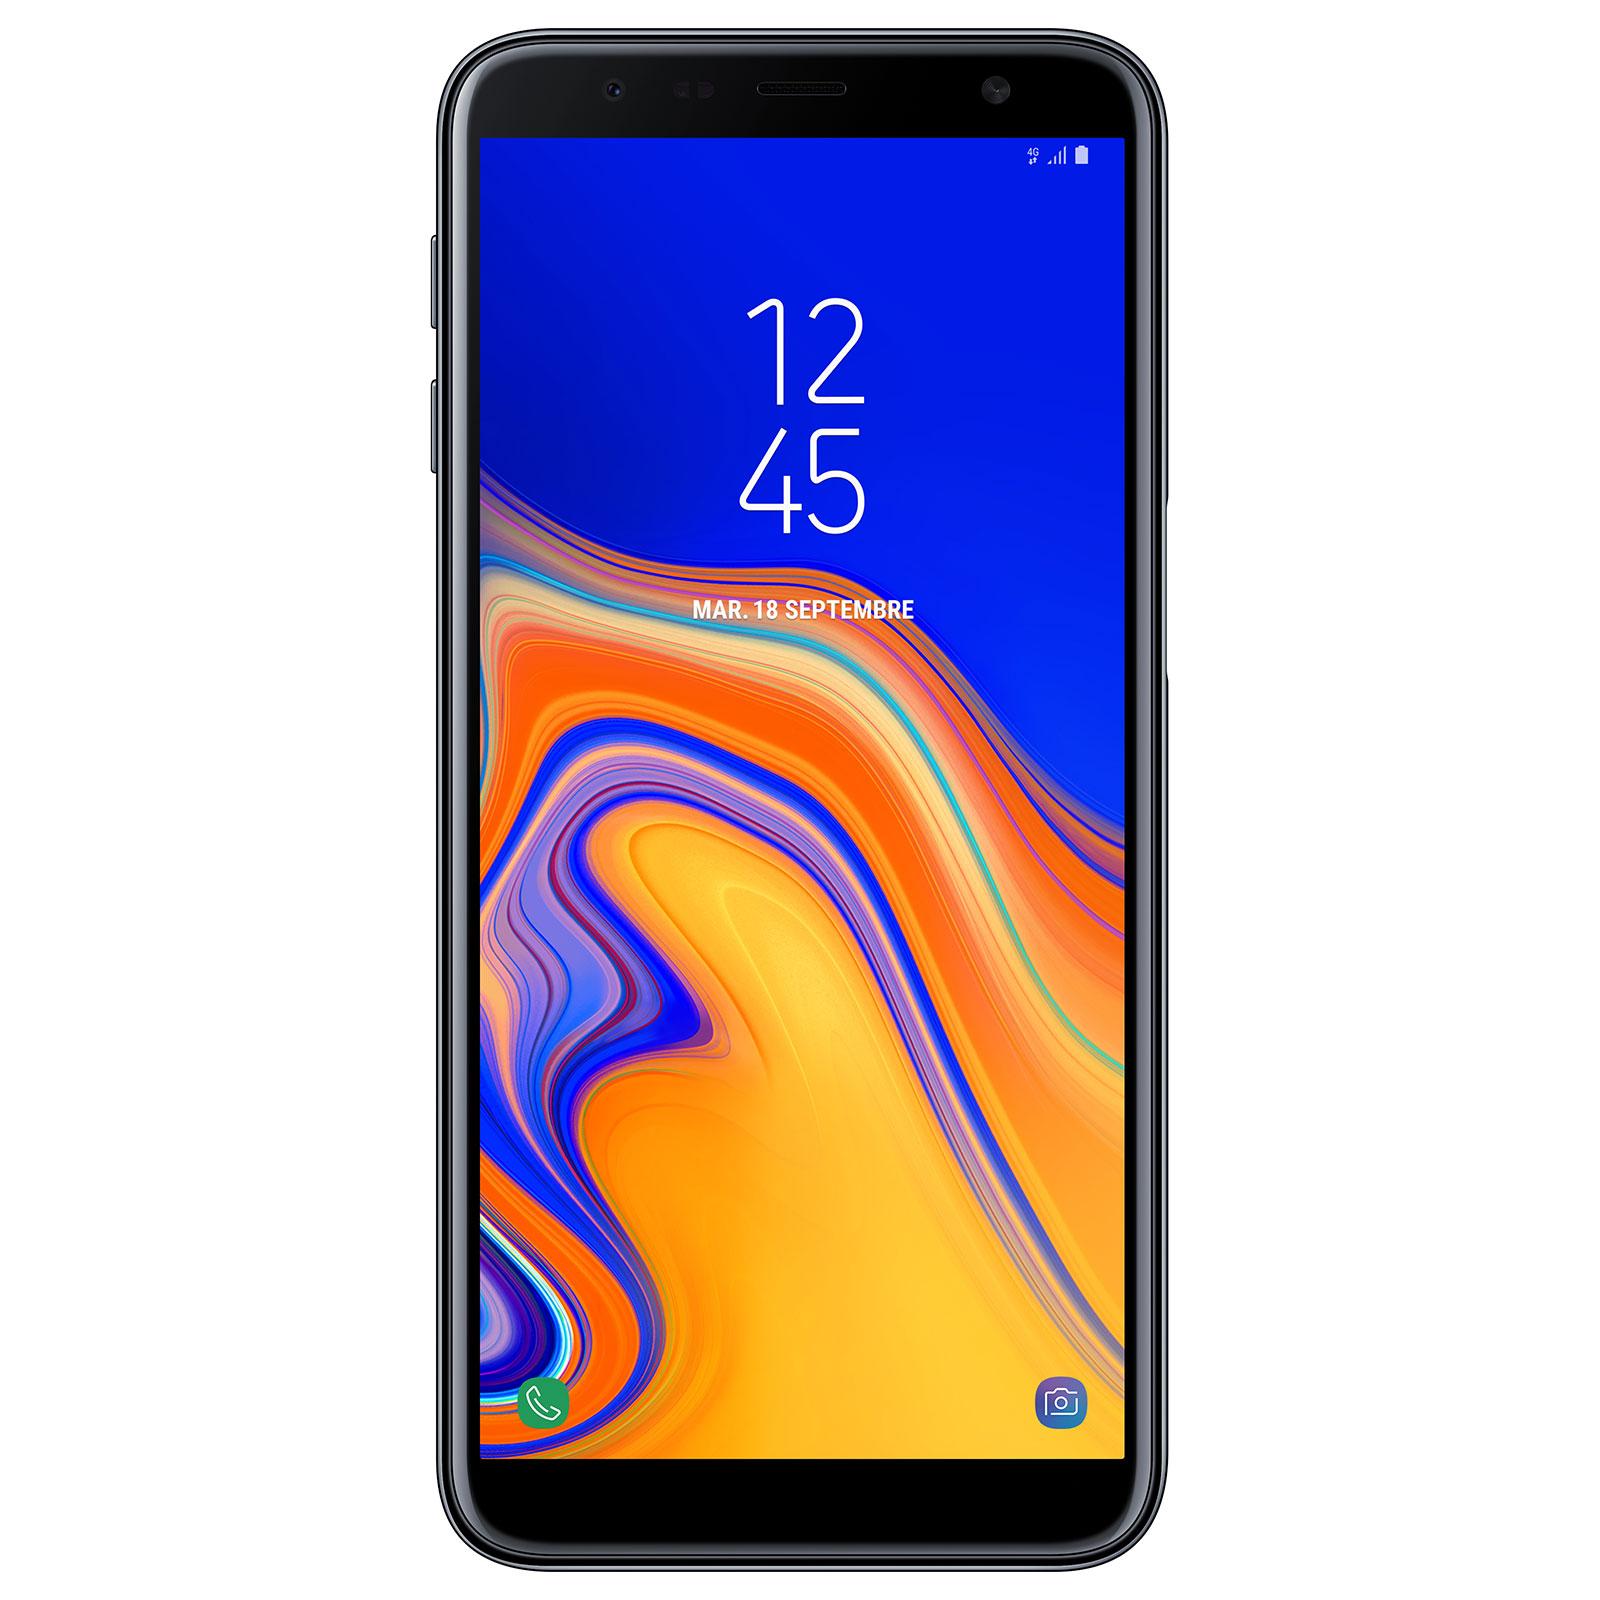 "Mobile & smartphone Samsung Galaxy J6+ Noir Smartphone 4G-LTE Dual SIM - Snapdragon 425 Quad-Core 1.4 Ghz - RAM 3 Go - Ecran tactile 6"" 720 x 1480 - 32 Go - NFC/Bluetooth 4.2 - 3300 mAh - Android 8.1"